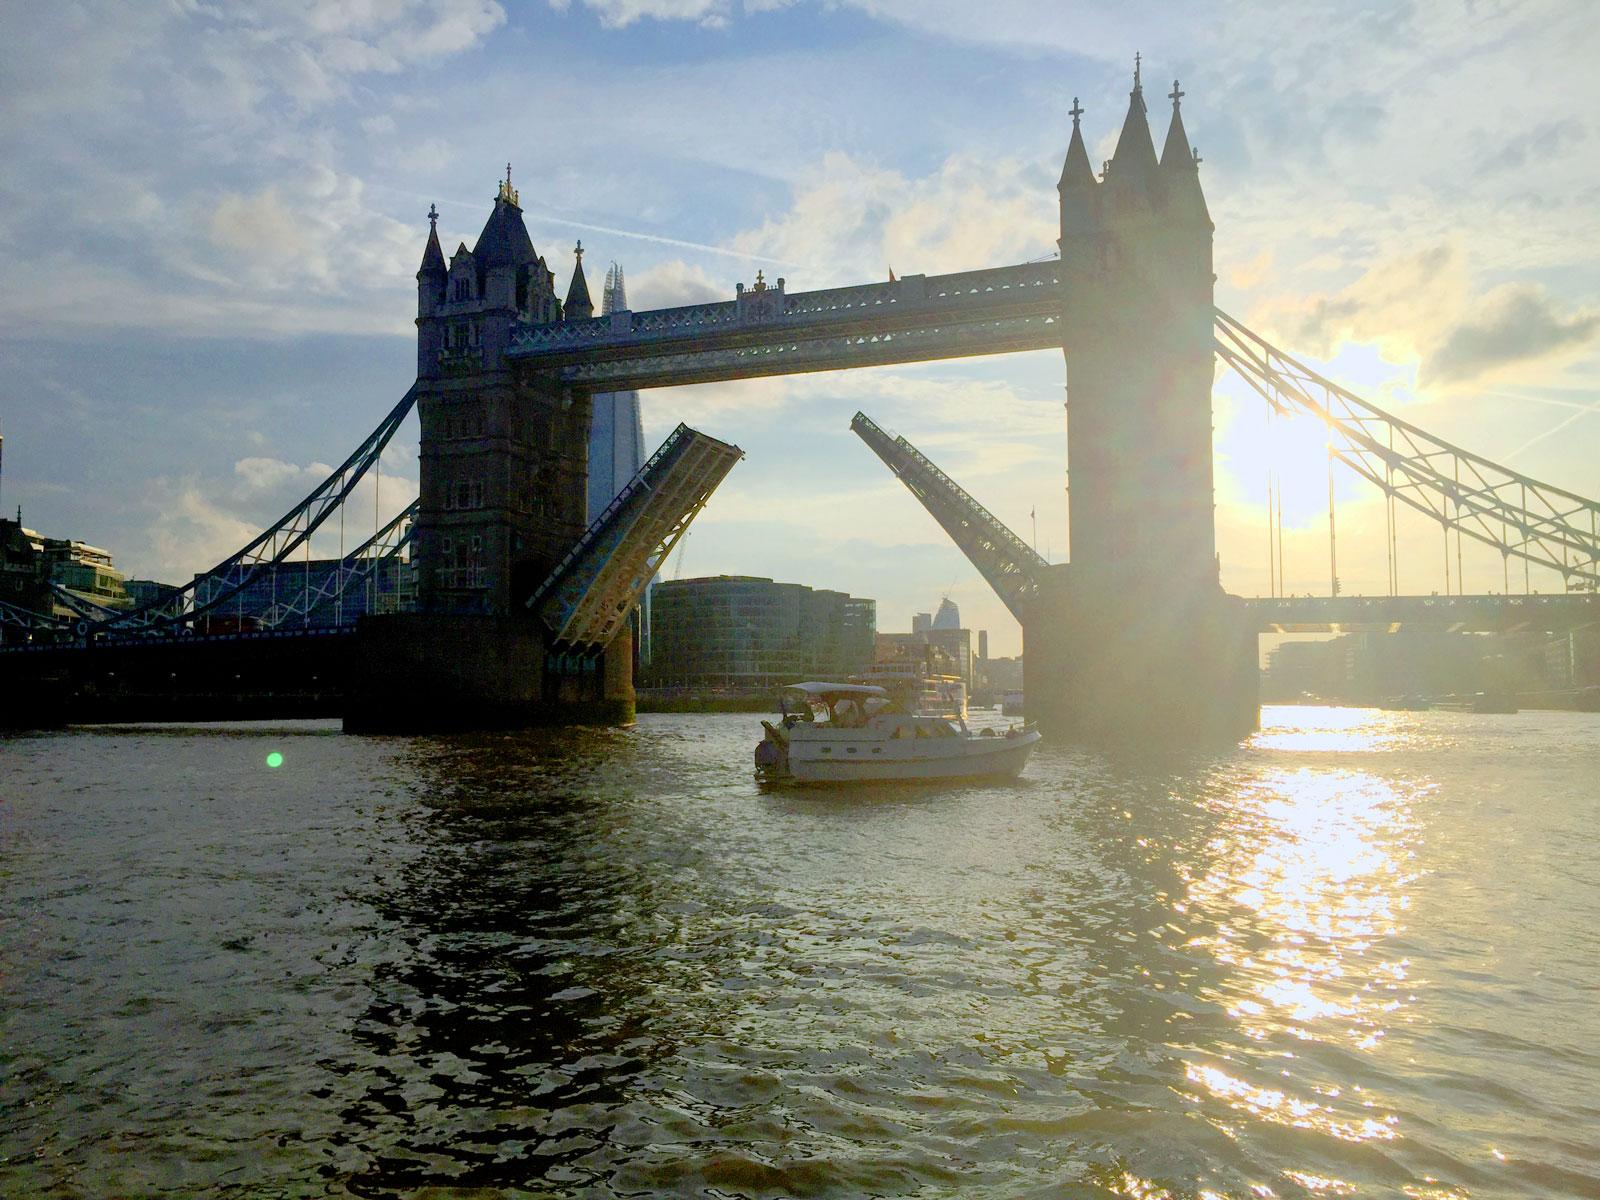 Route 2; Oost Engeland en Londen